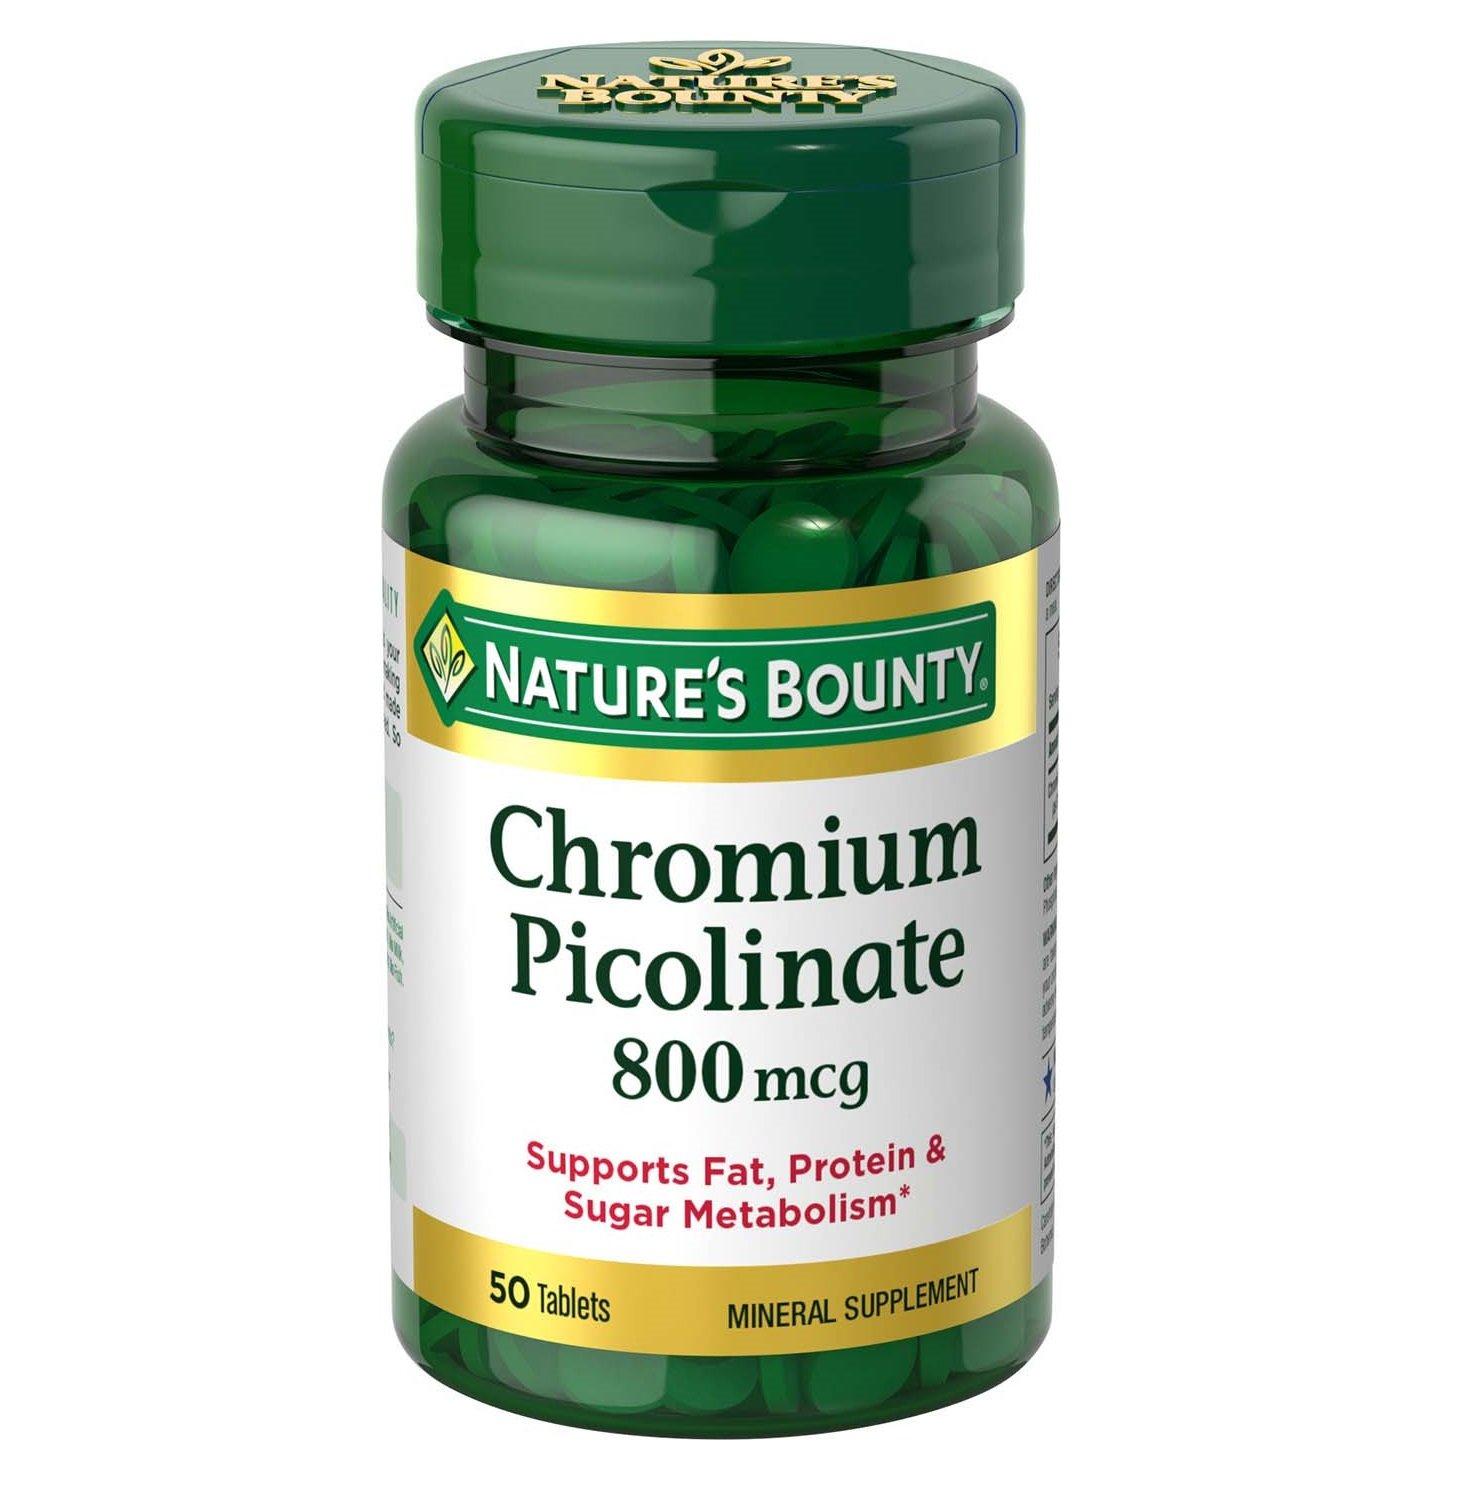 Nature's Bounty Chromium Picolinate Tablets, 800 mcg, 50 Count